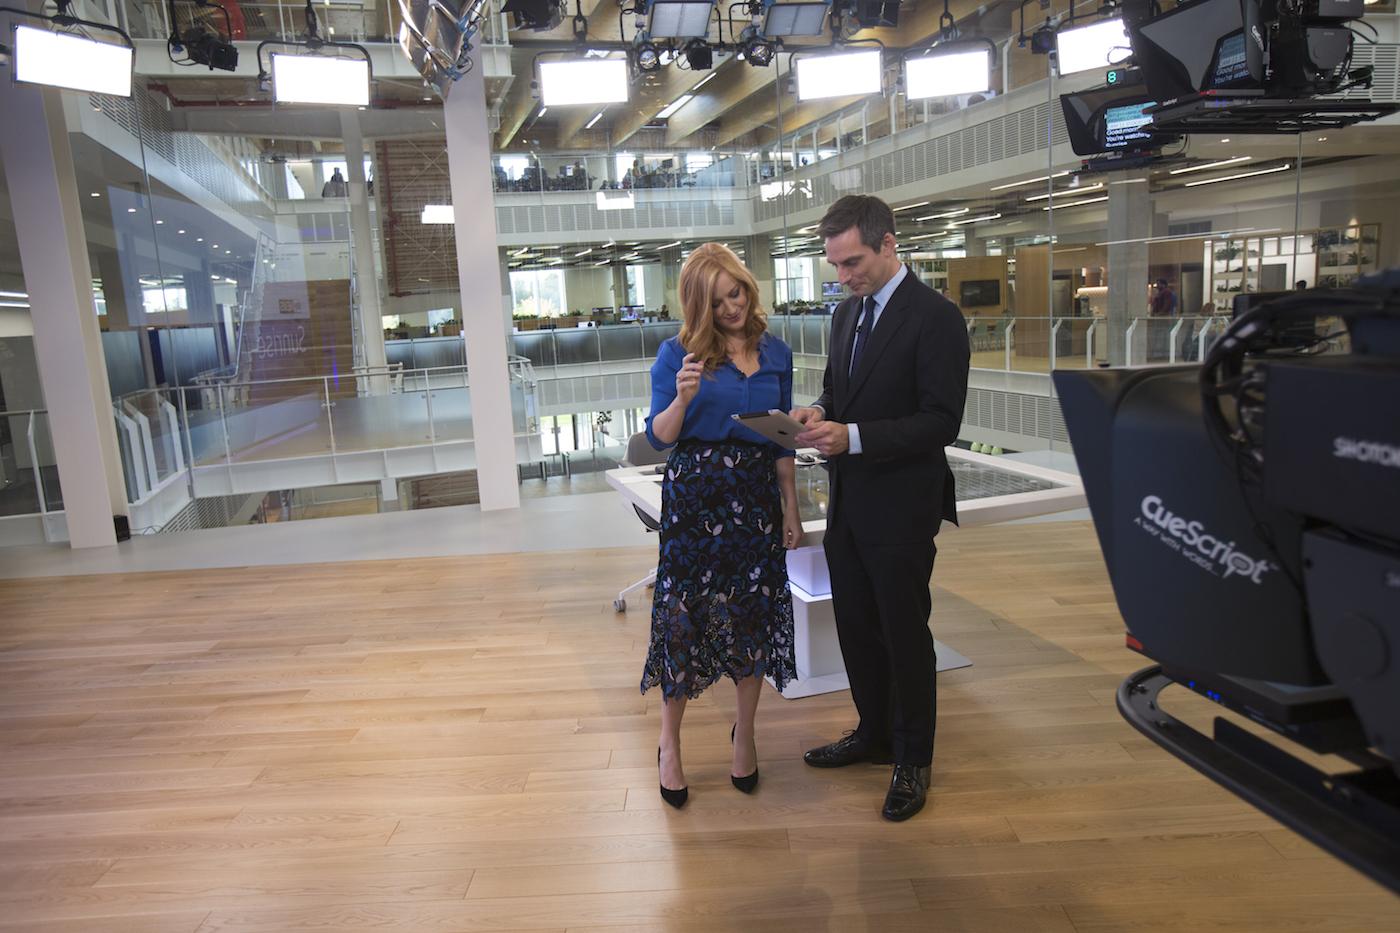 Jonathan and Sarah-Jane Mee getting to know the new Sky News studio.